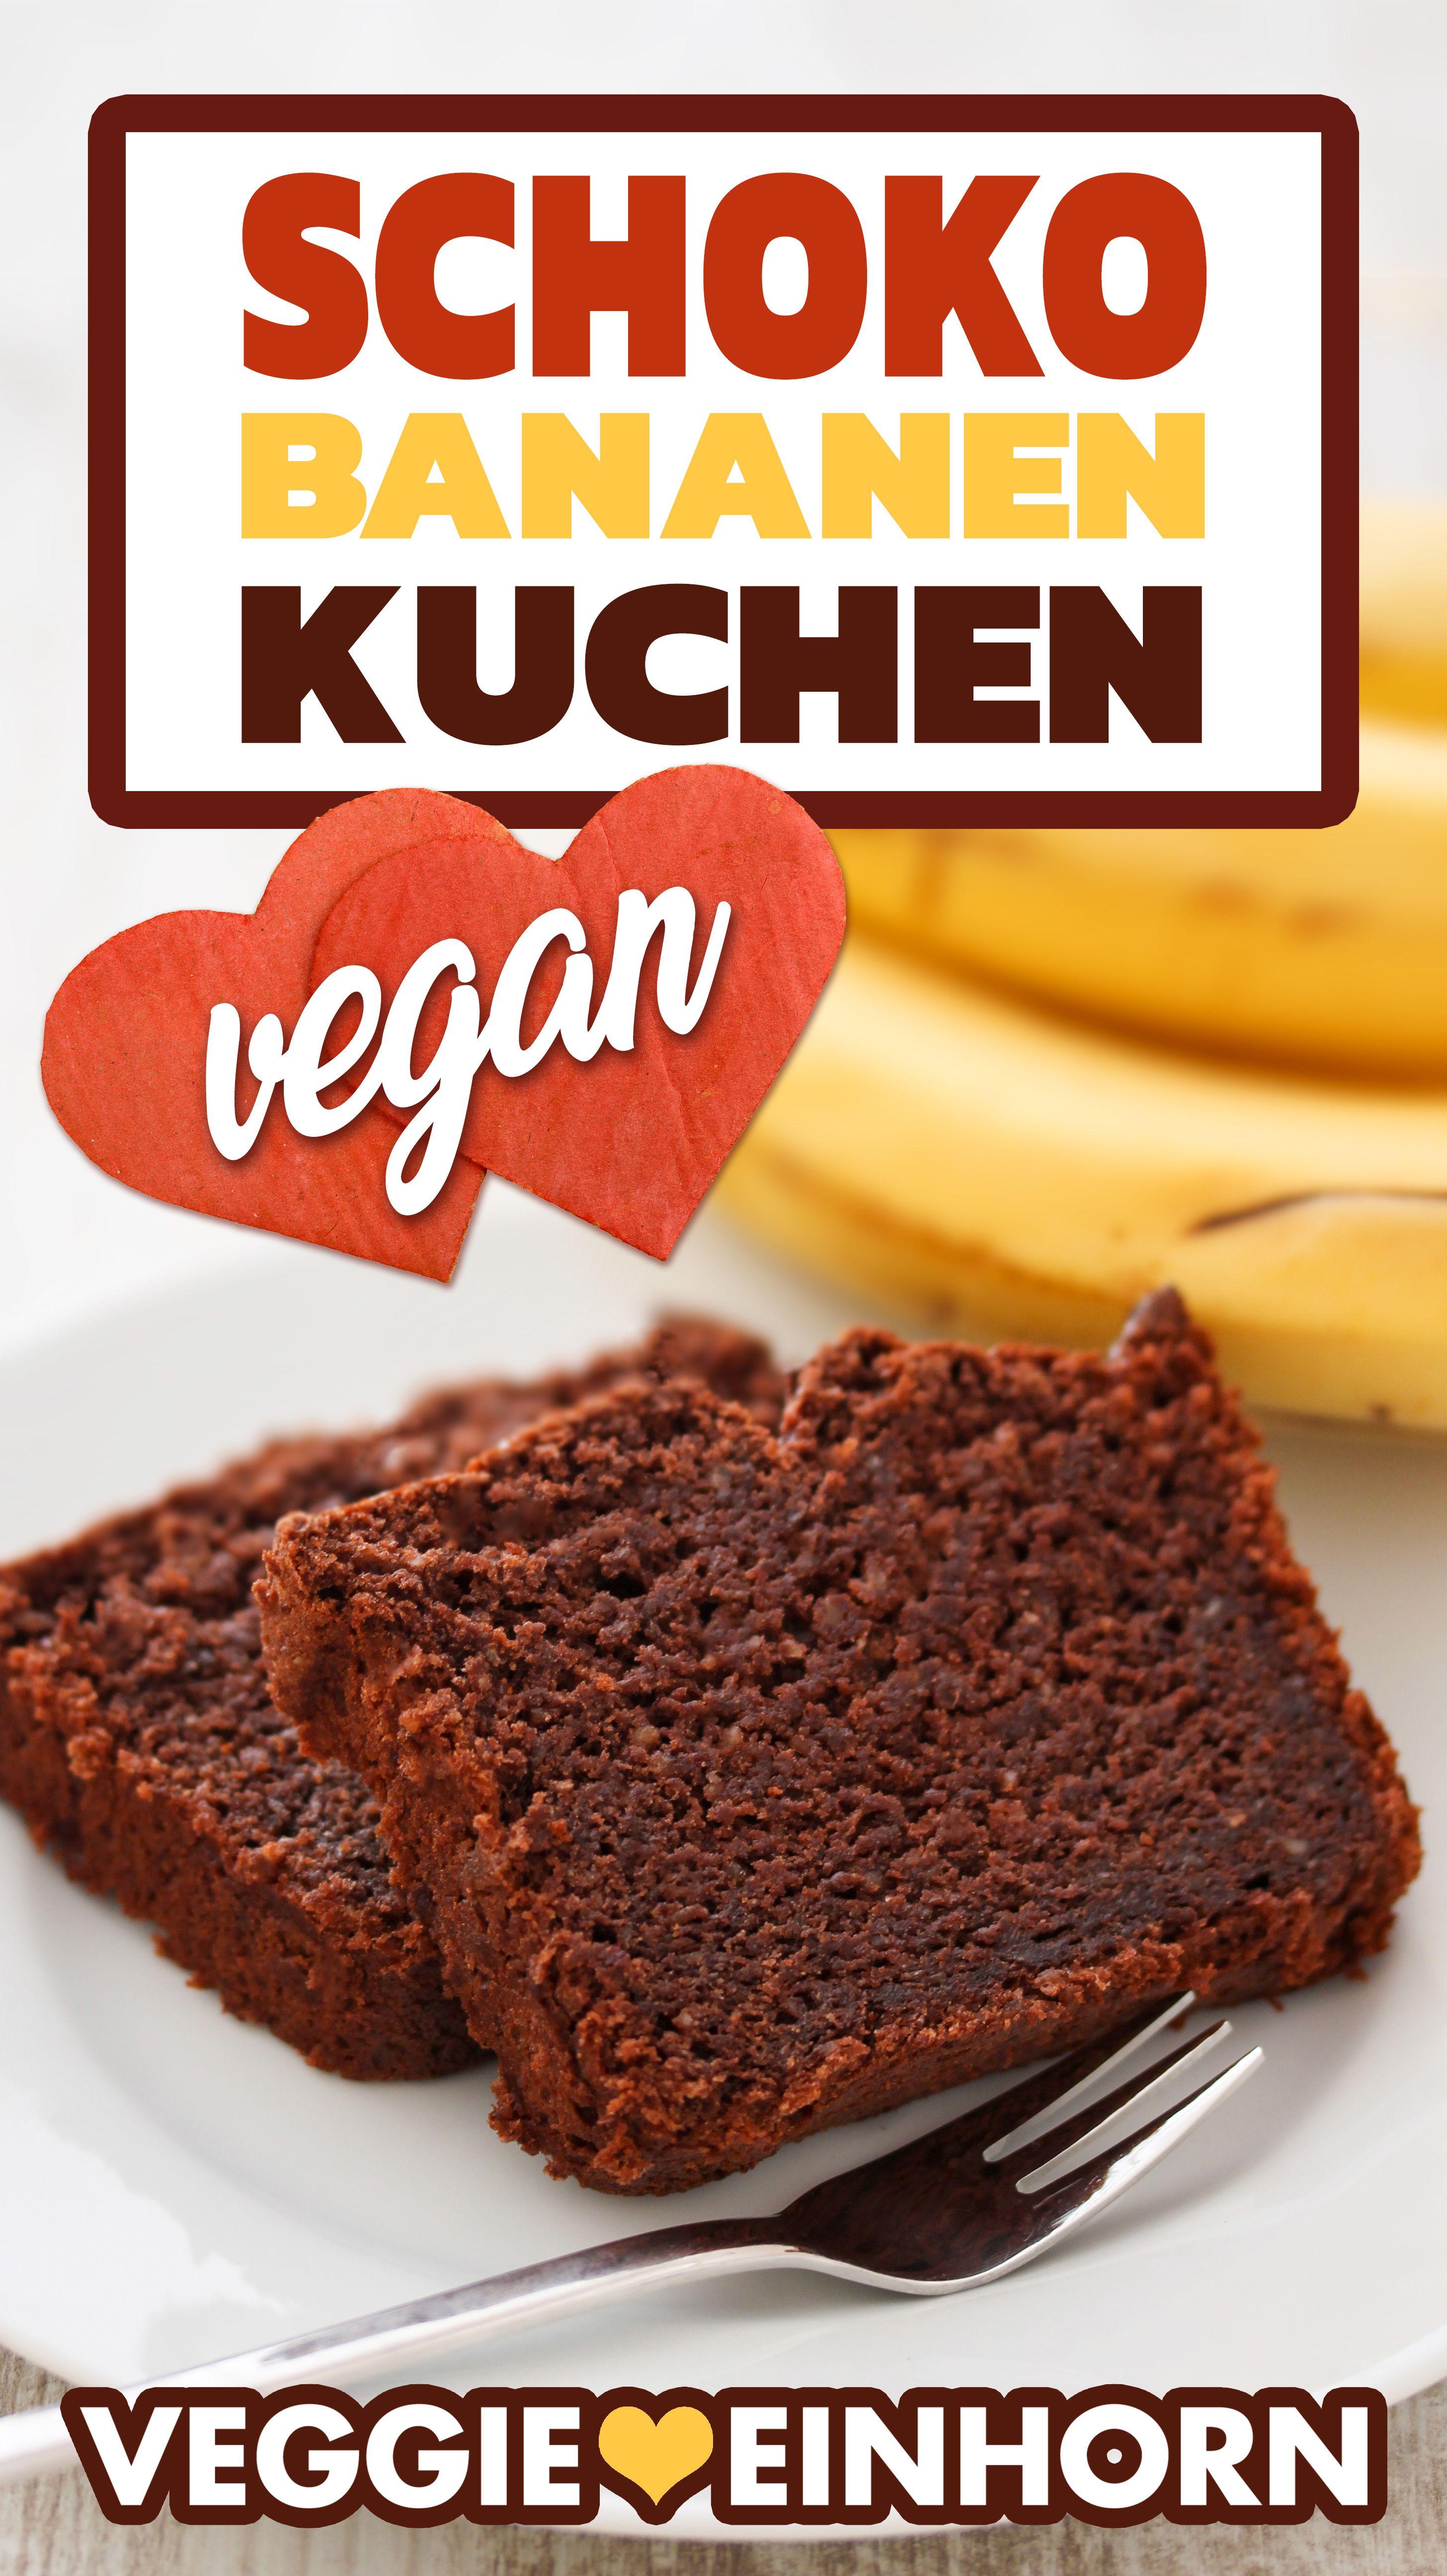 Veganer Schoko Bananen Kuchen Rezept In 2020 Schoko Bananen Kuchen Vegan Schoko Bananen Kuchen Bananen Kuchen